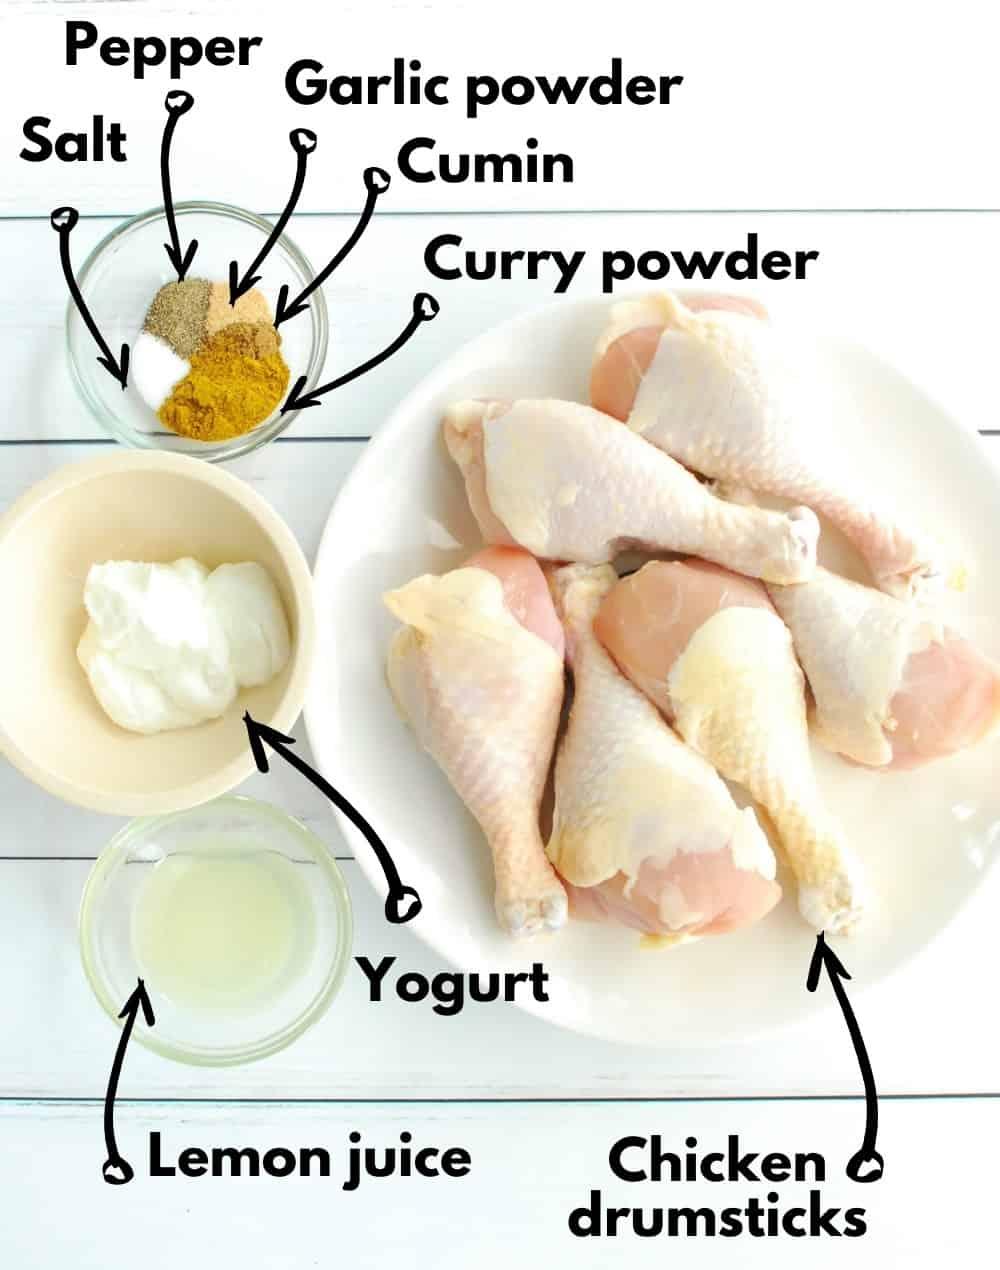 Overhead shot of chicken drumsticks, lemon juice, yogurt, and spice blend.